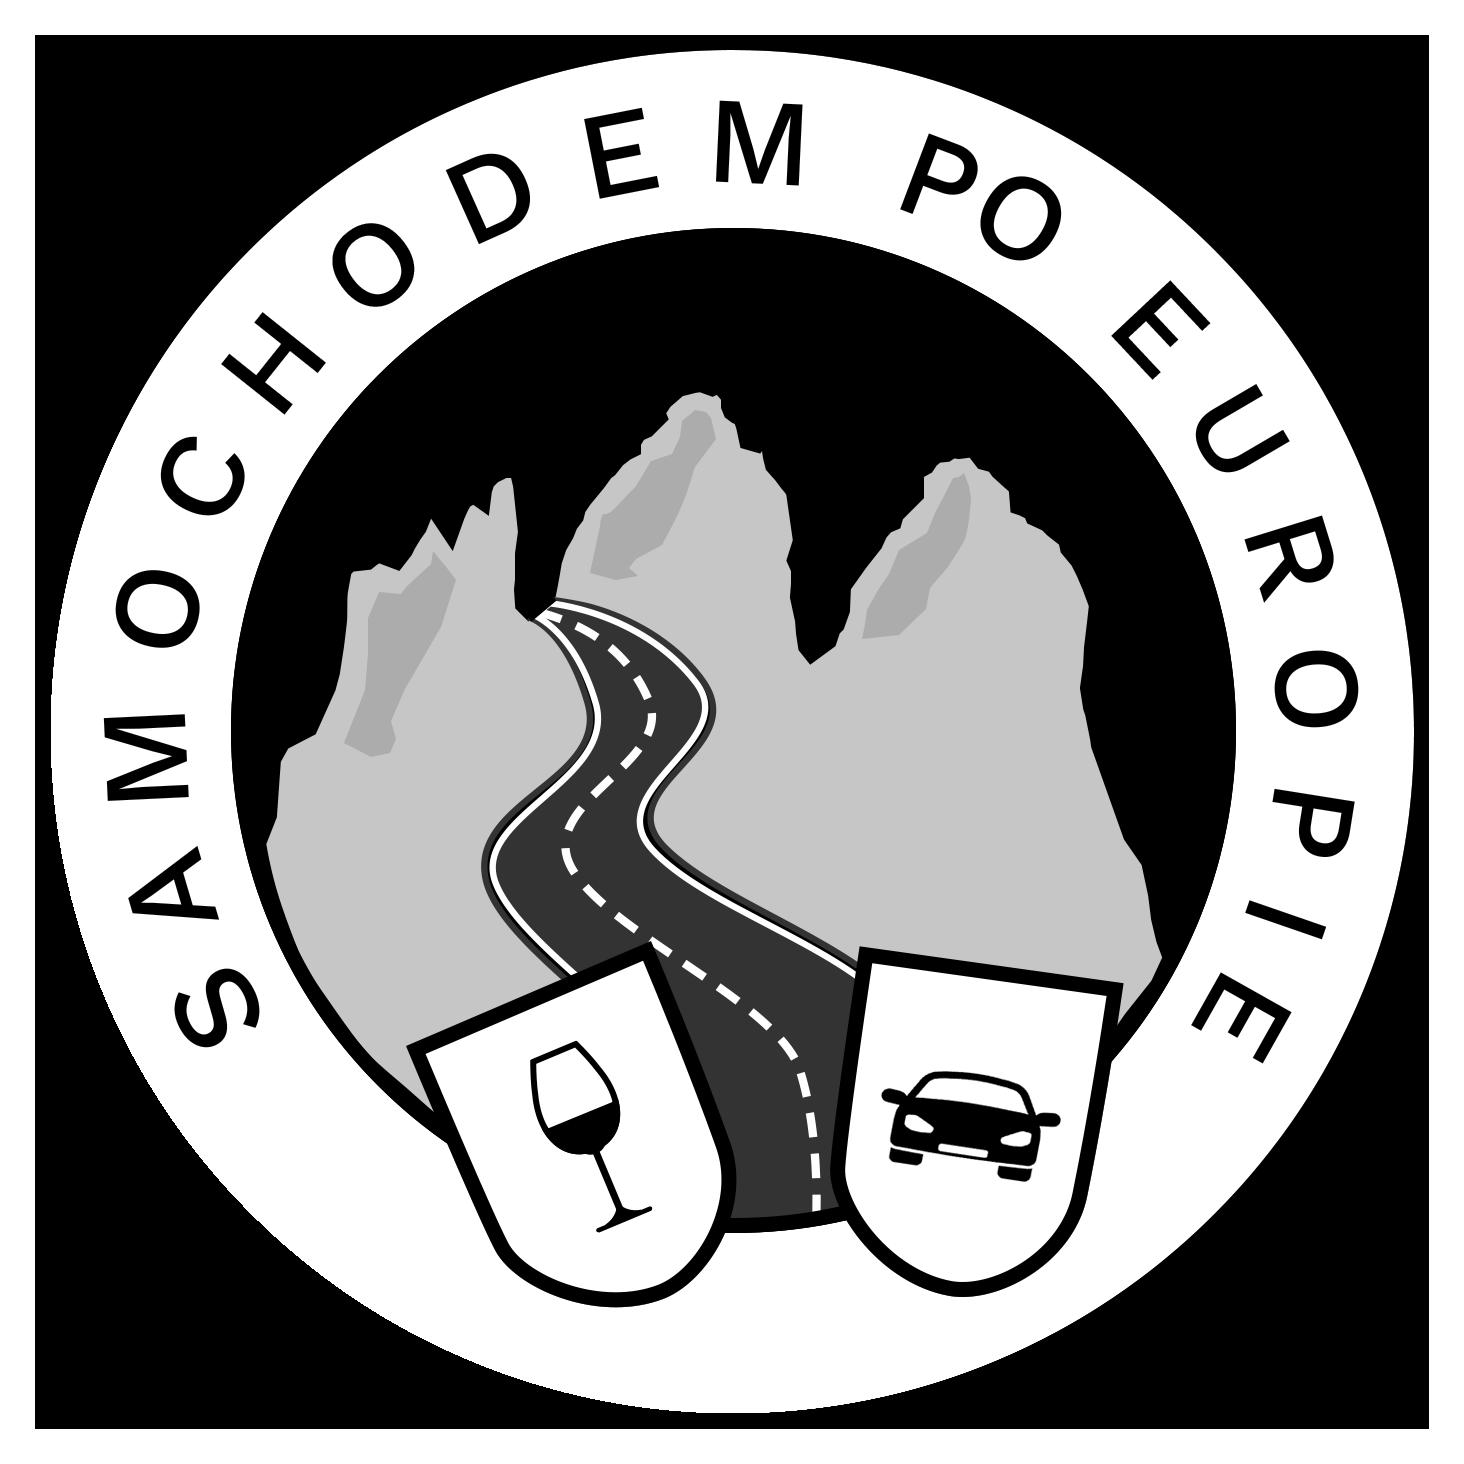 Samochodem po Europie - logo